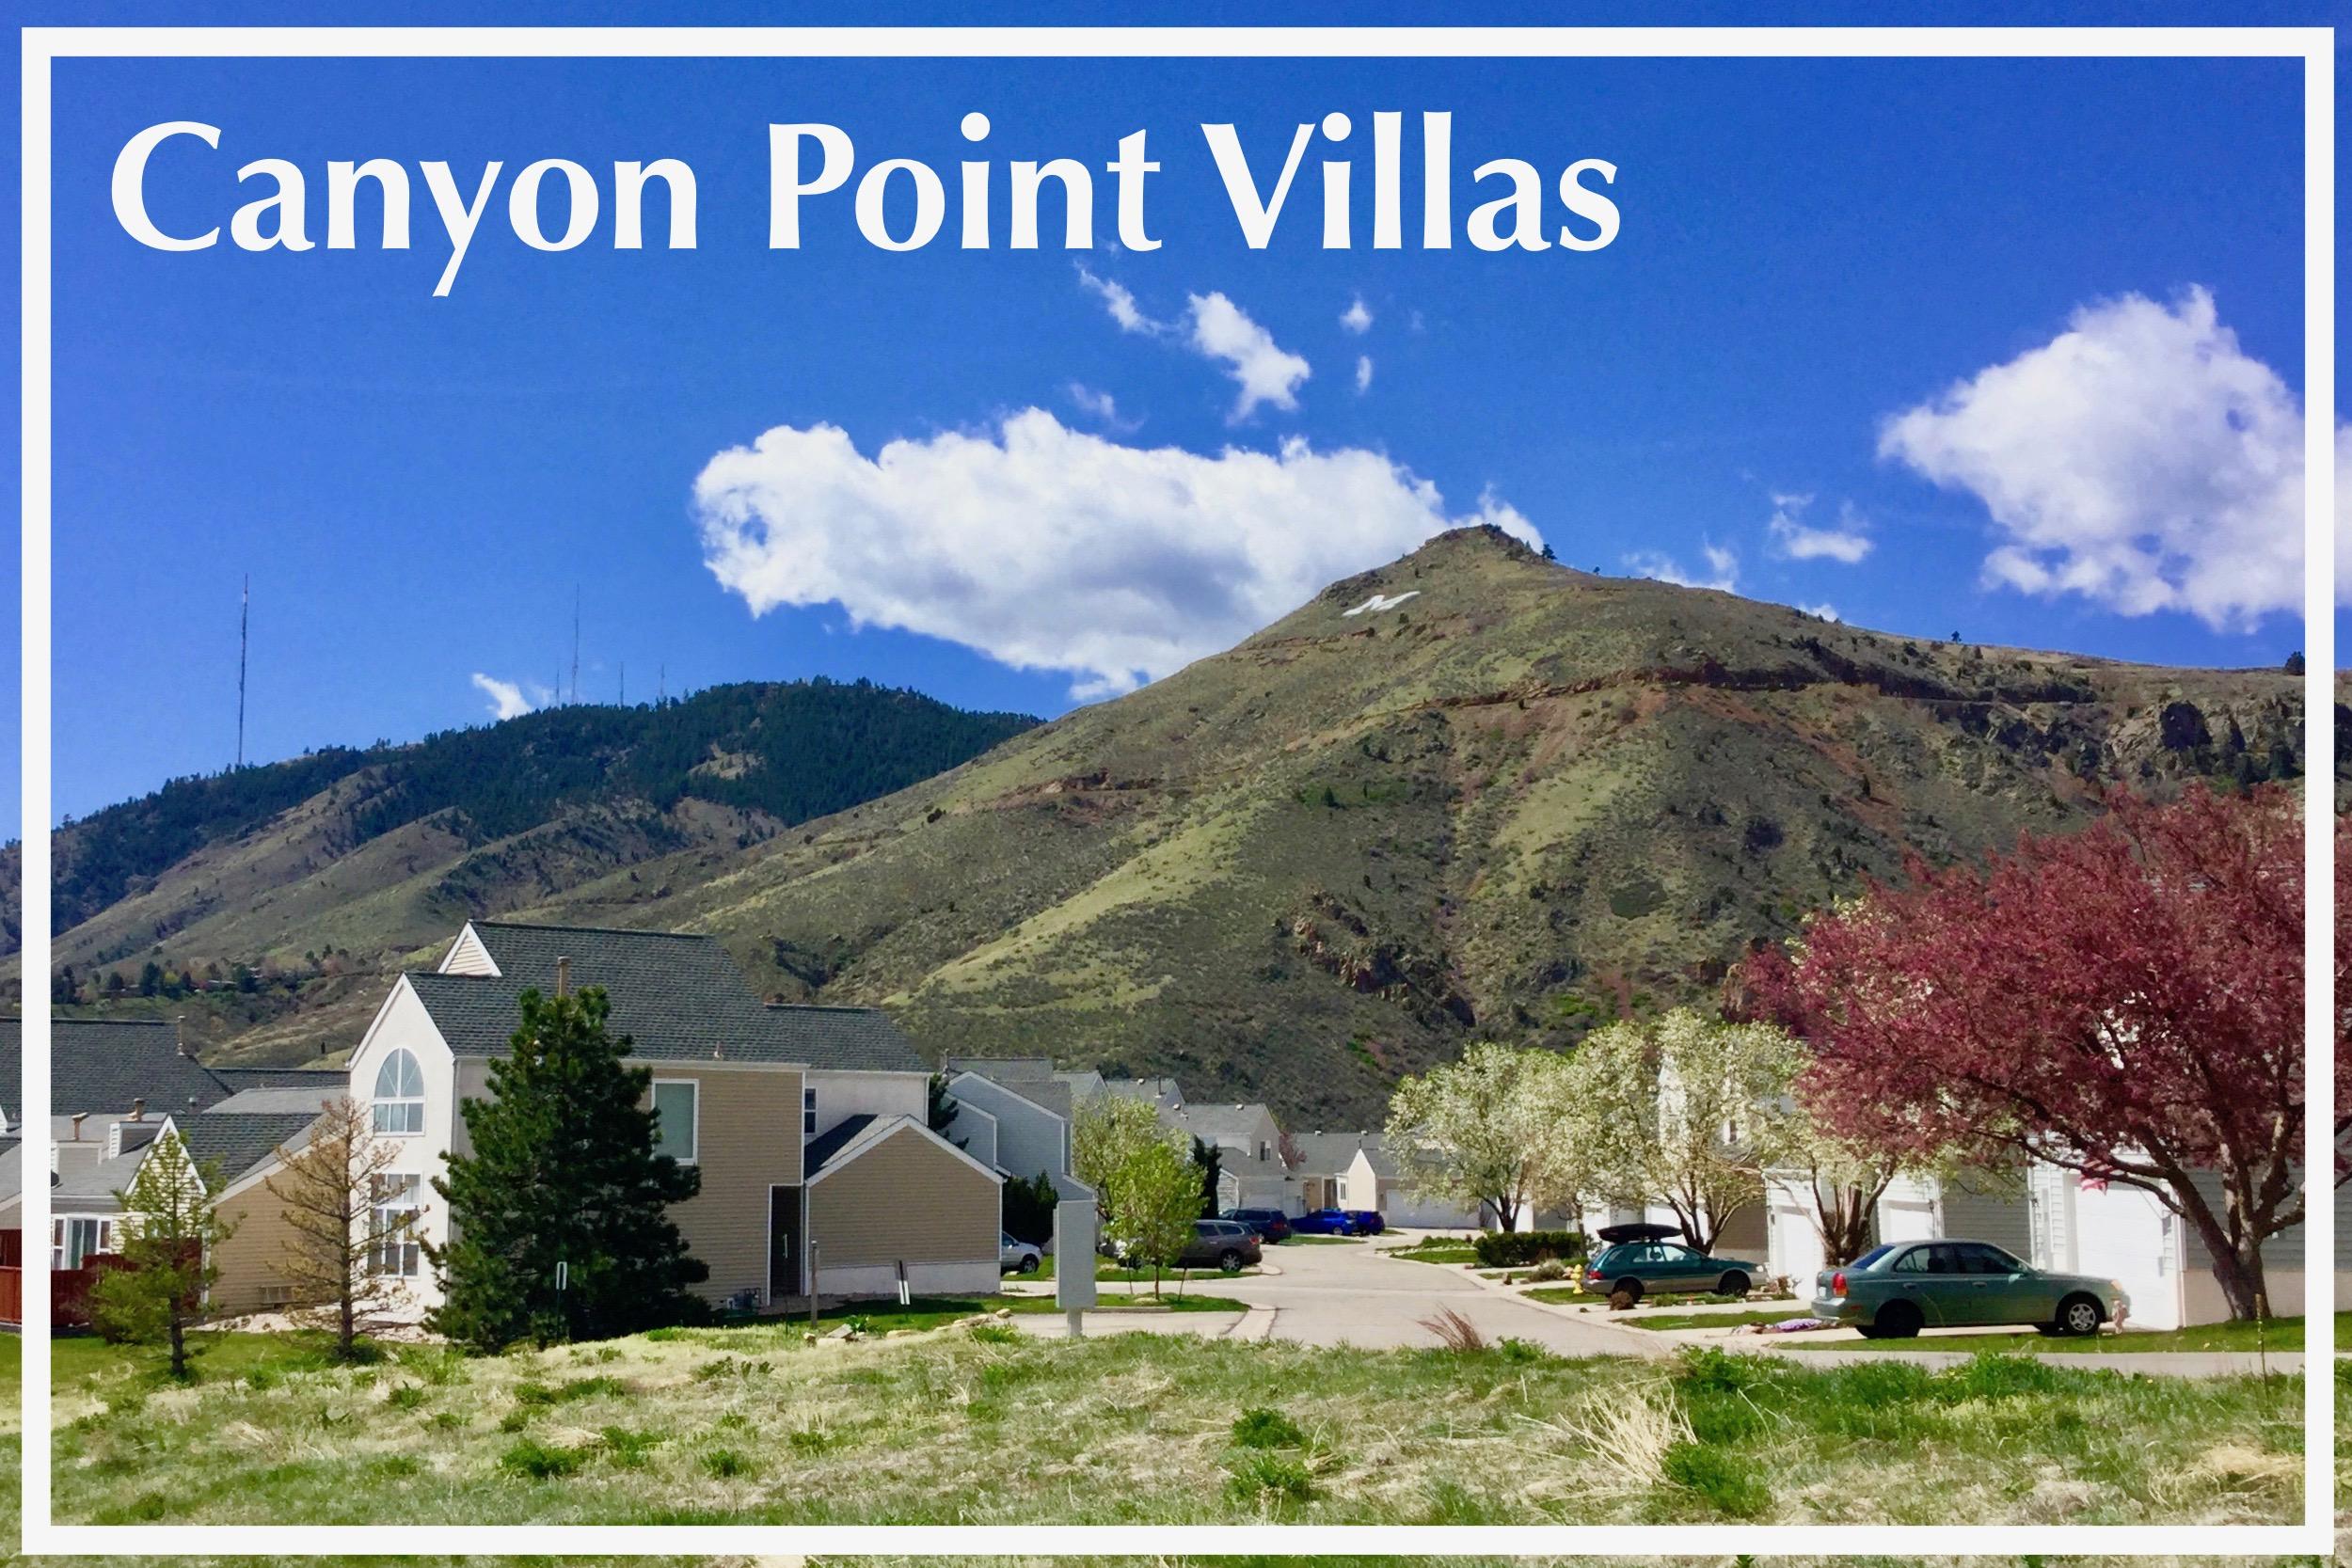 Canyon Point Villas.jpg